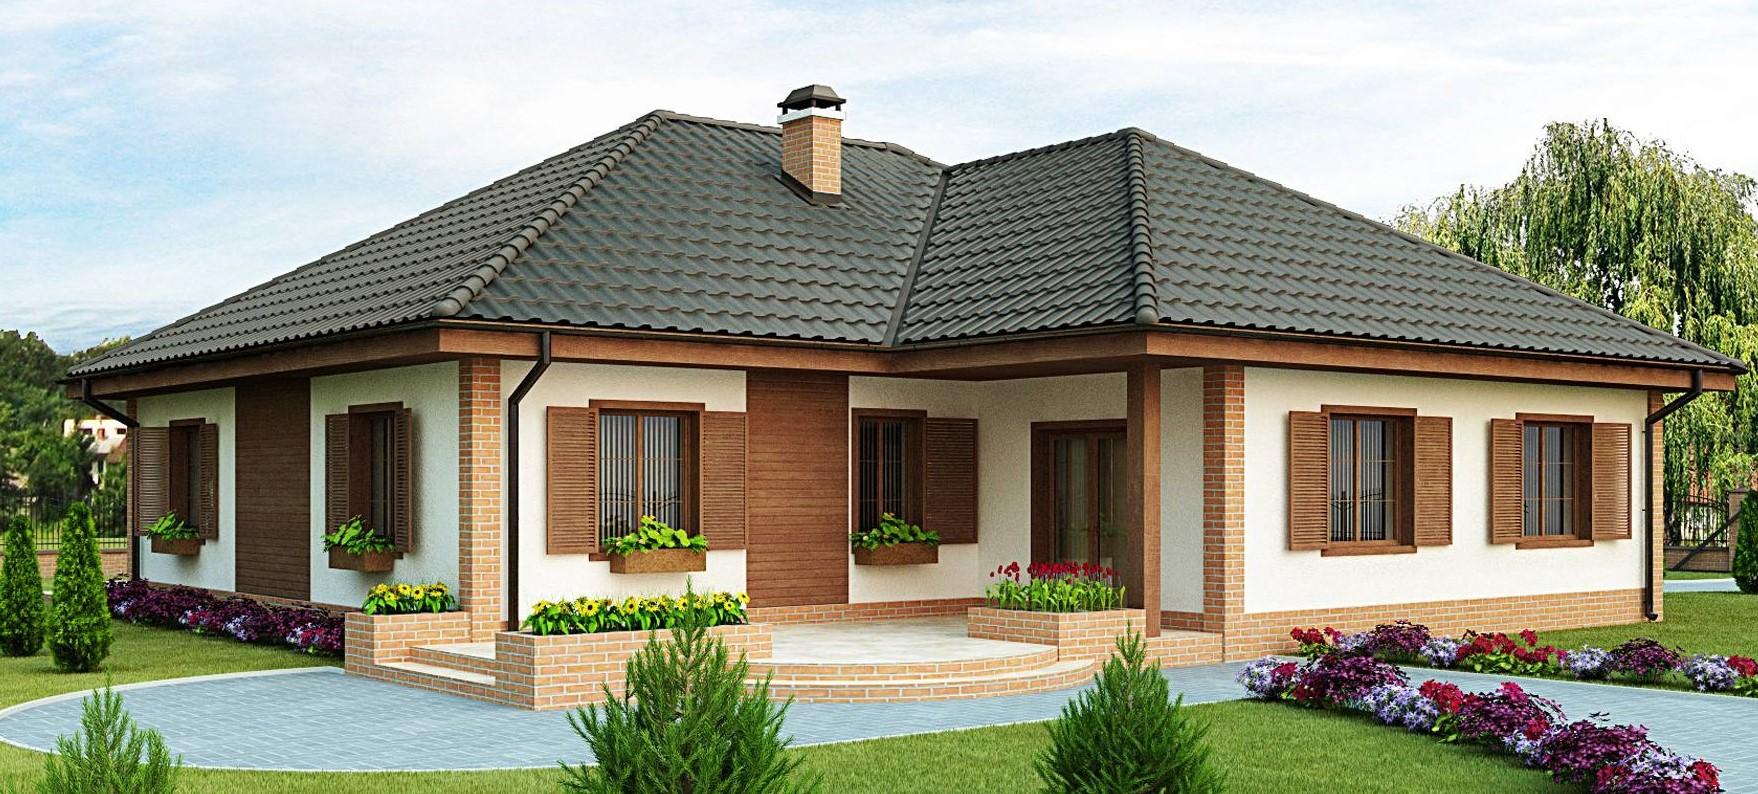 http://stavreka.cz/wp-content/uploads/2020/05/P1A.jpg